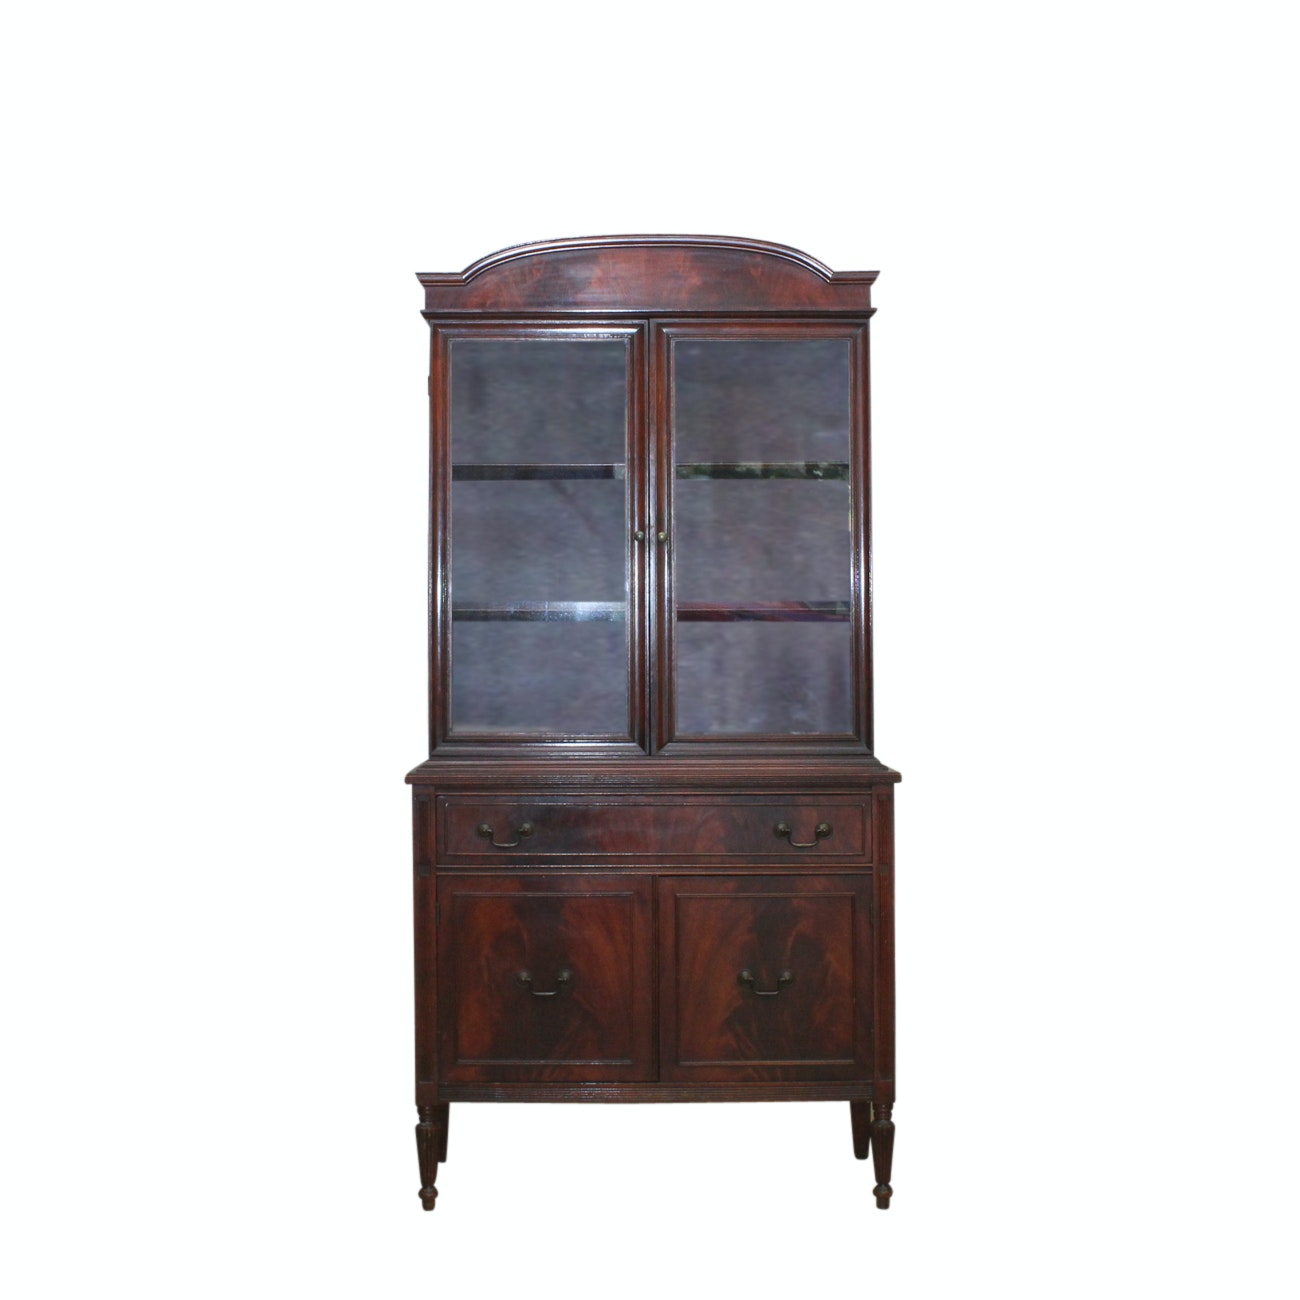 Banuer Furniture Co. China Cabinet